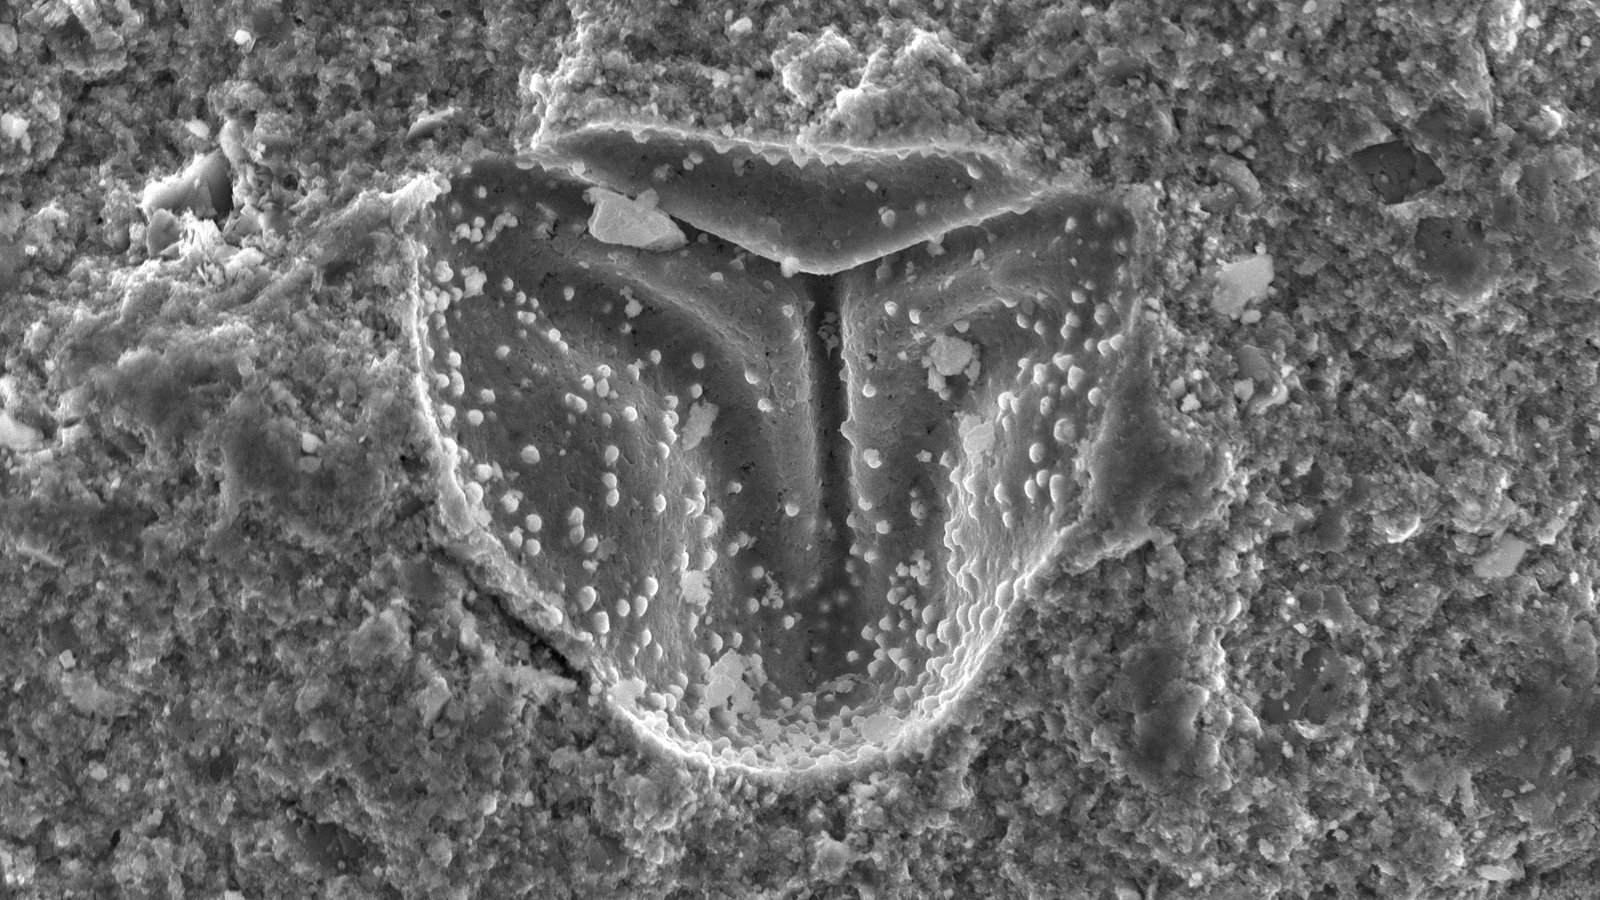 Microfossil Pollen